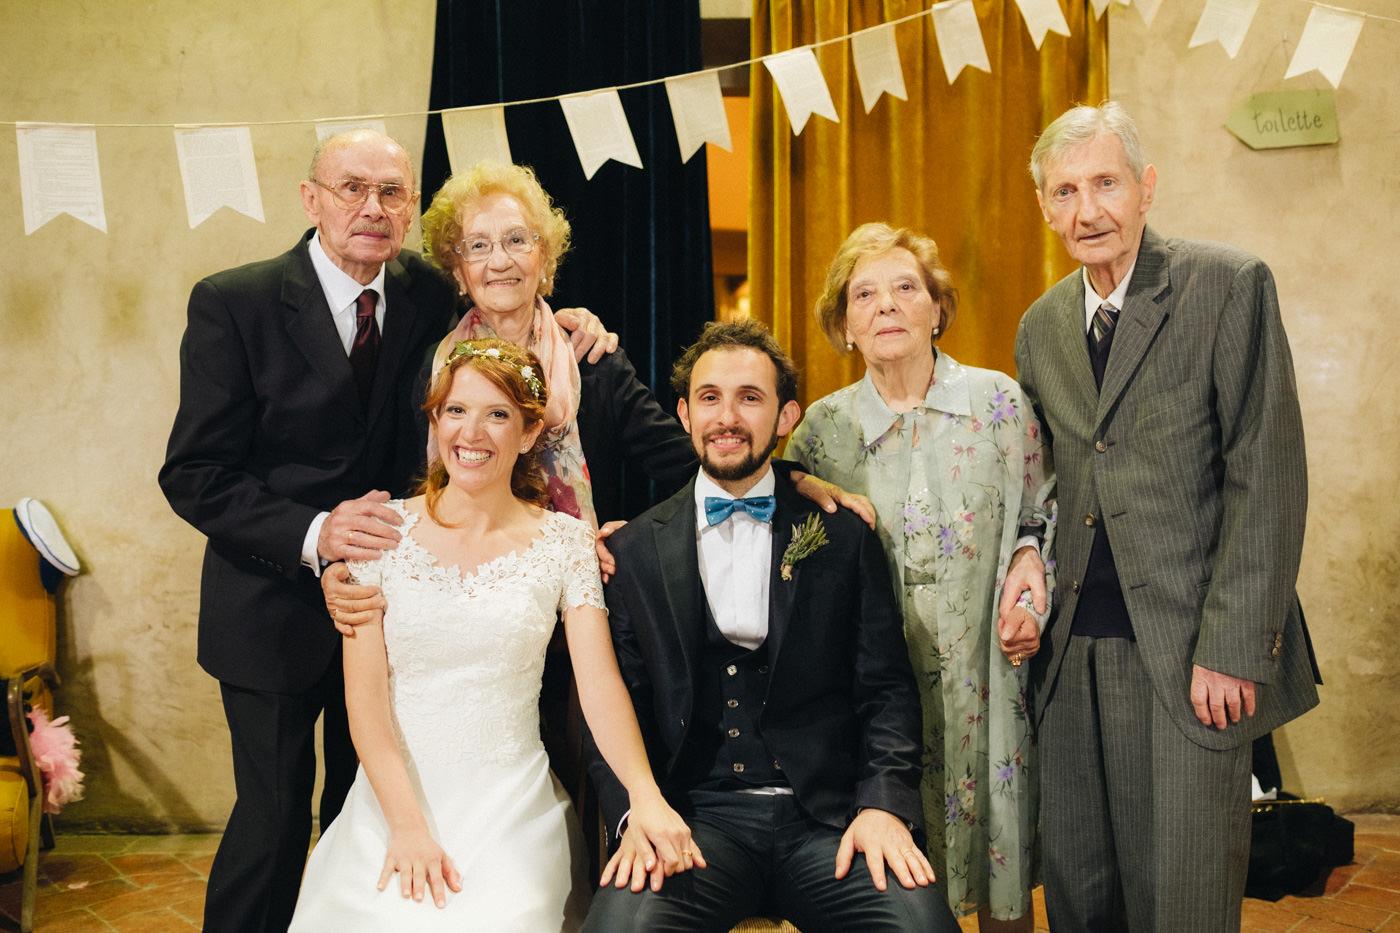 matrimoni_all_italiana_fotografo_matrimonio_toscana-72.jpg